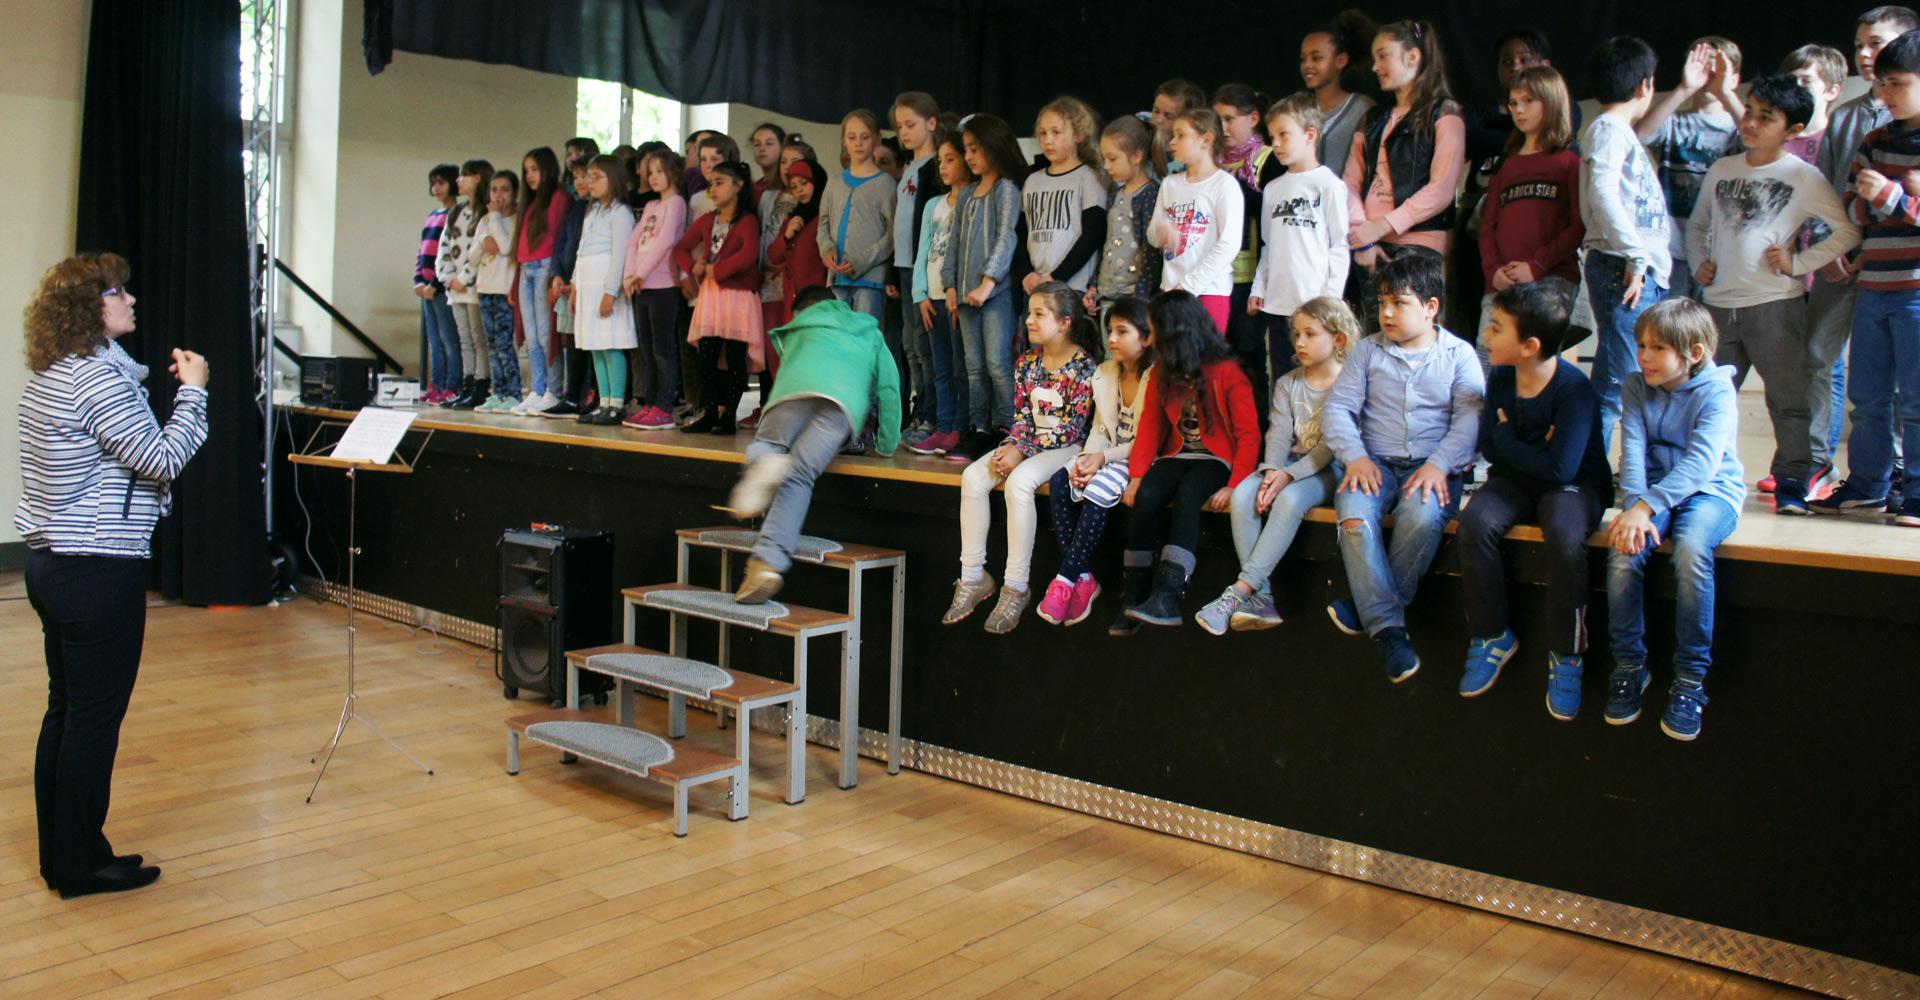 Unser Schulchor singt …